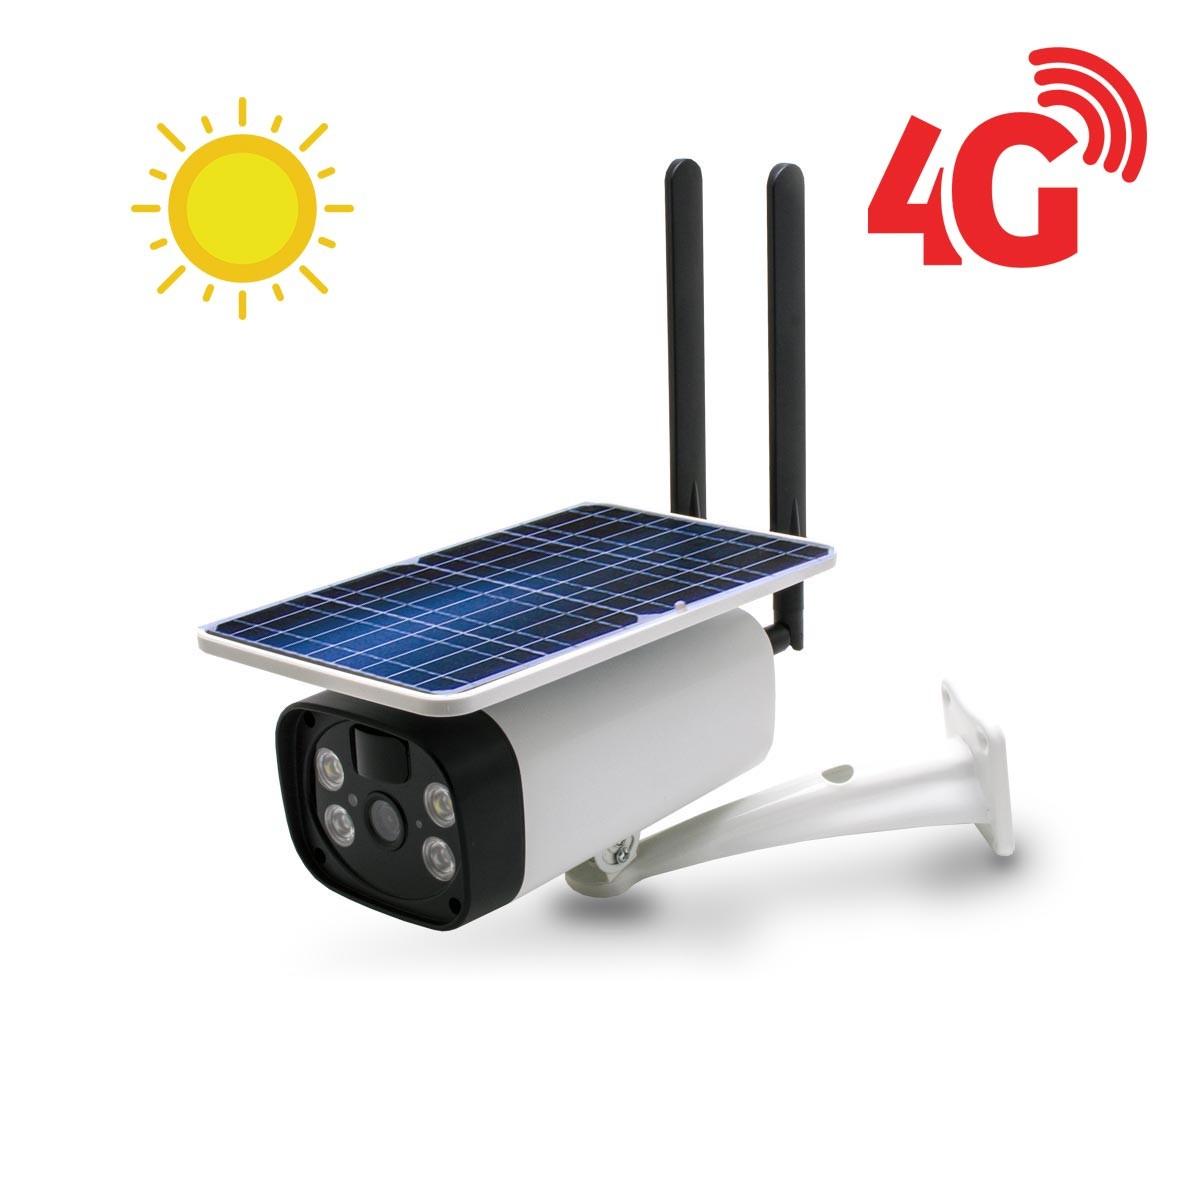 Caméra solaire IP GSM 4G HD 1080P 64 Go inclus waterproof Infrarouge accès à distance via iPhone Android